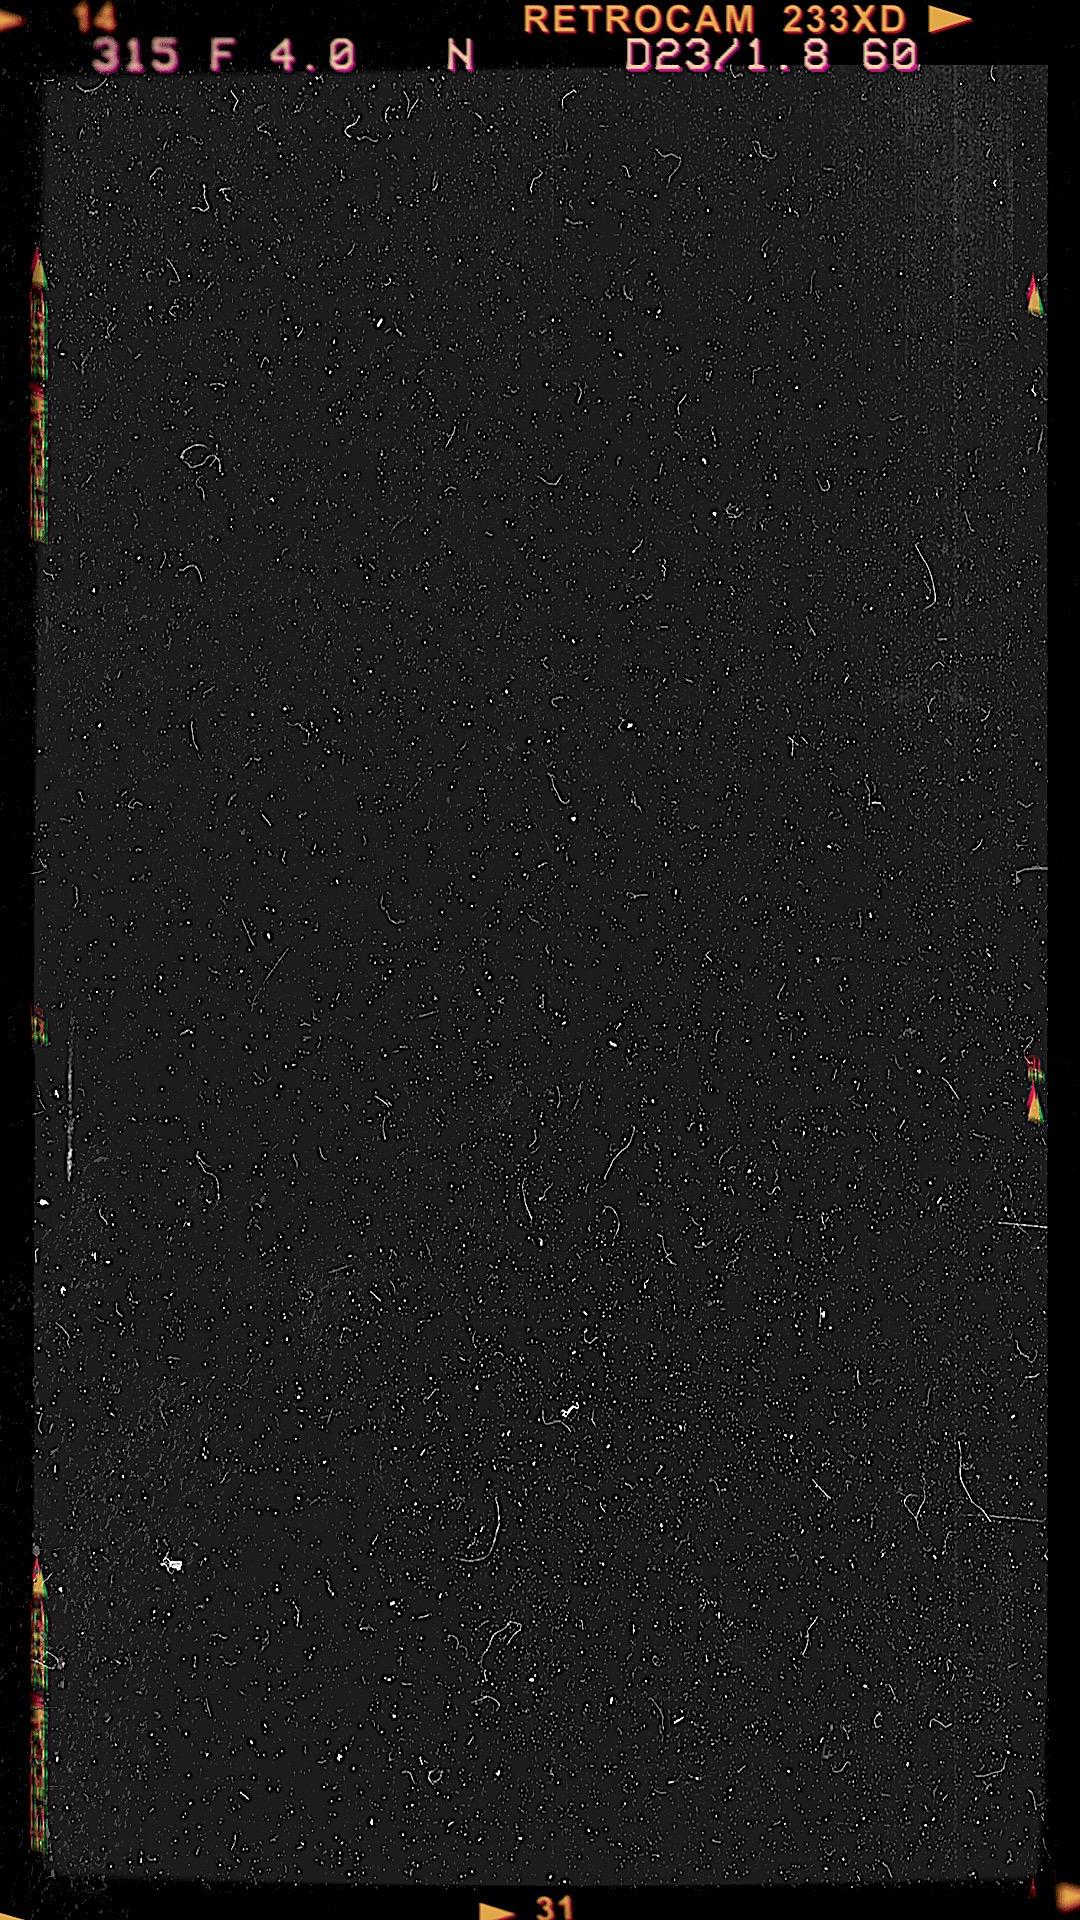 Dark Backgrounds 4 (JPG)